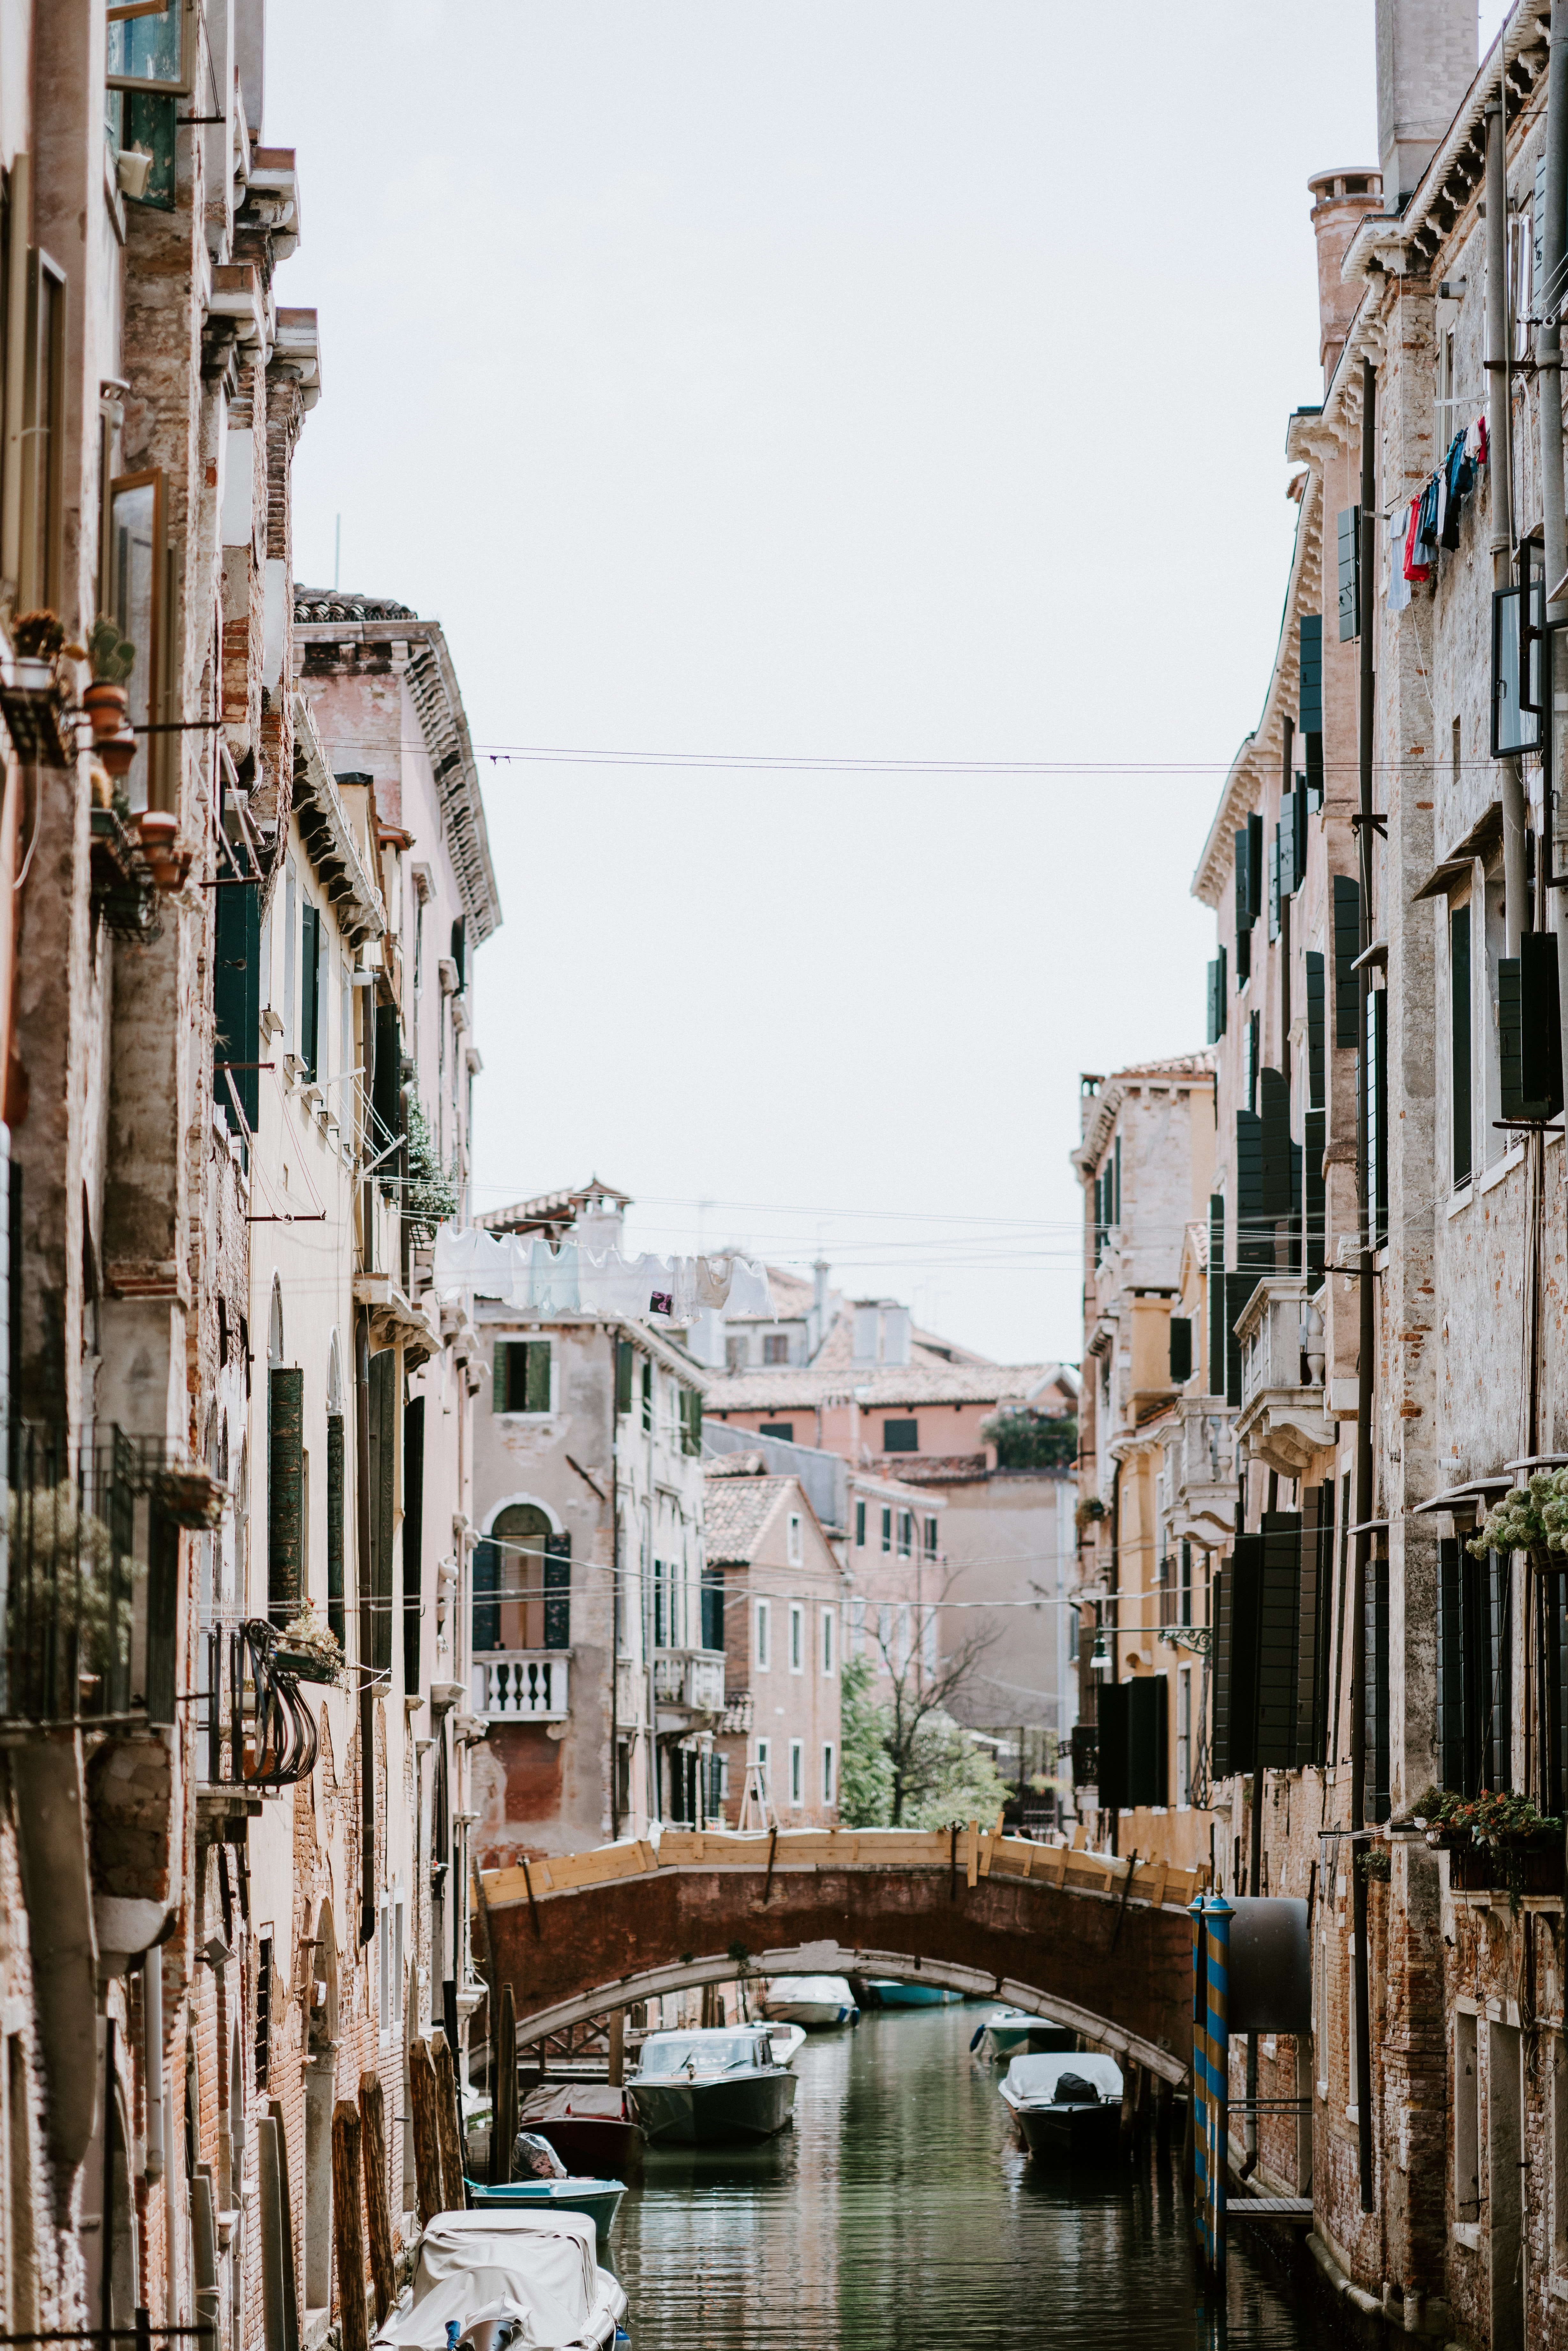 bridge of sigh, Venice Canal